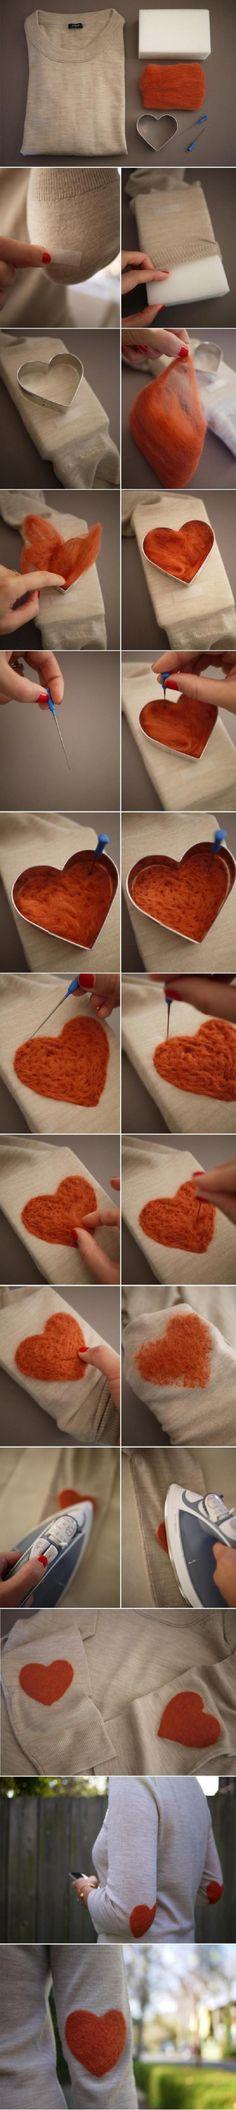 DIY Heart elbow long sleeve shirt